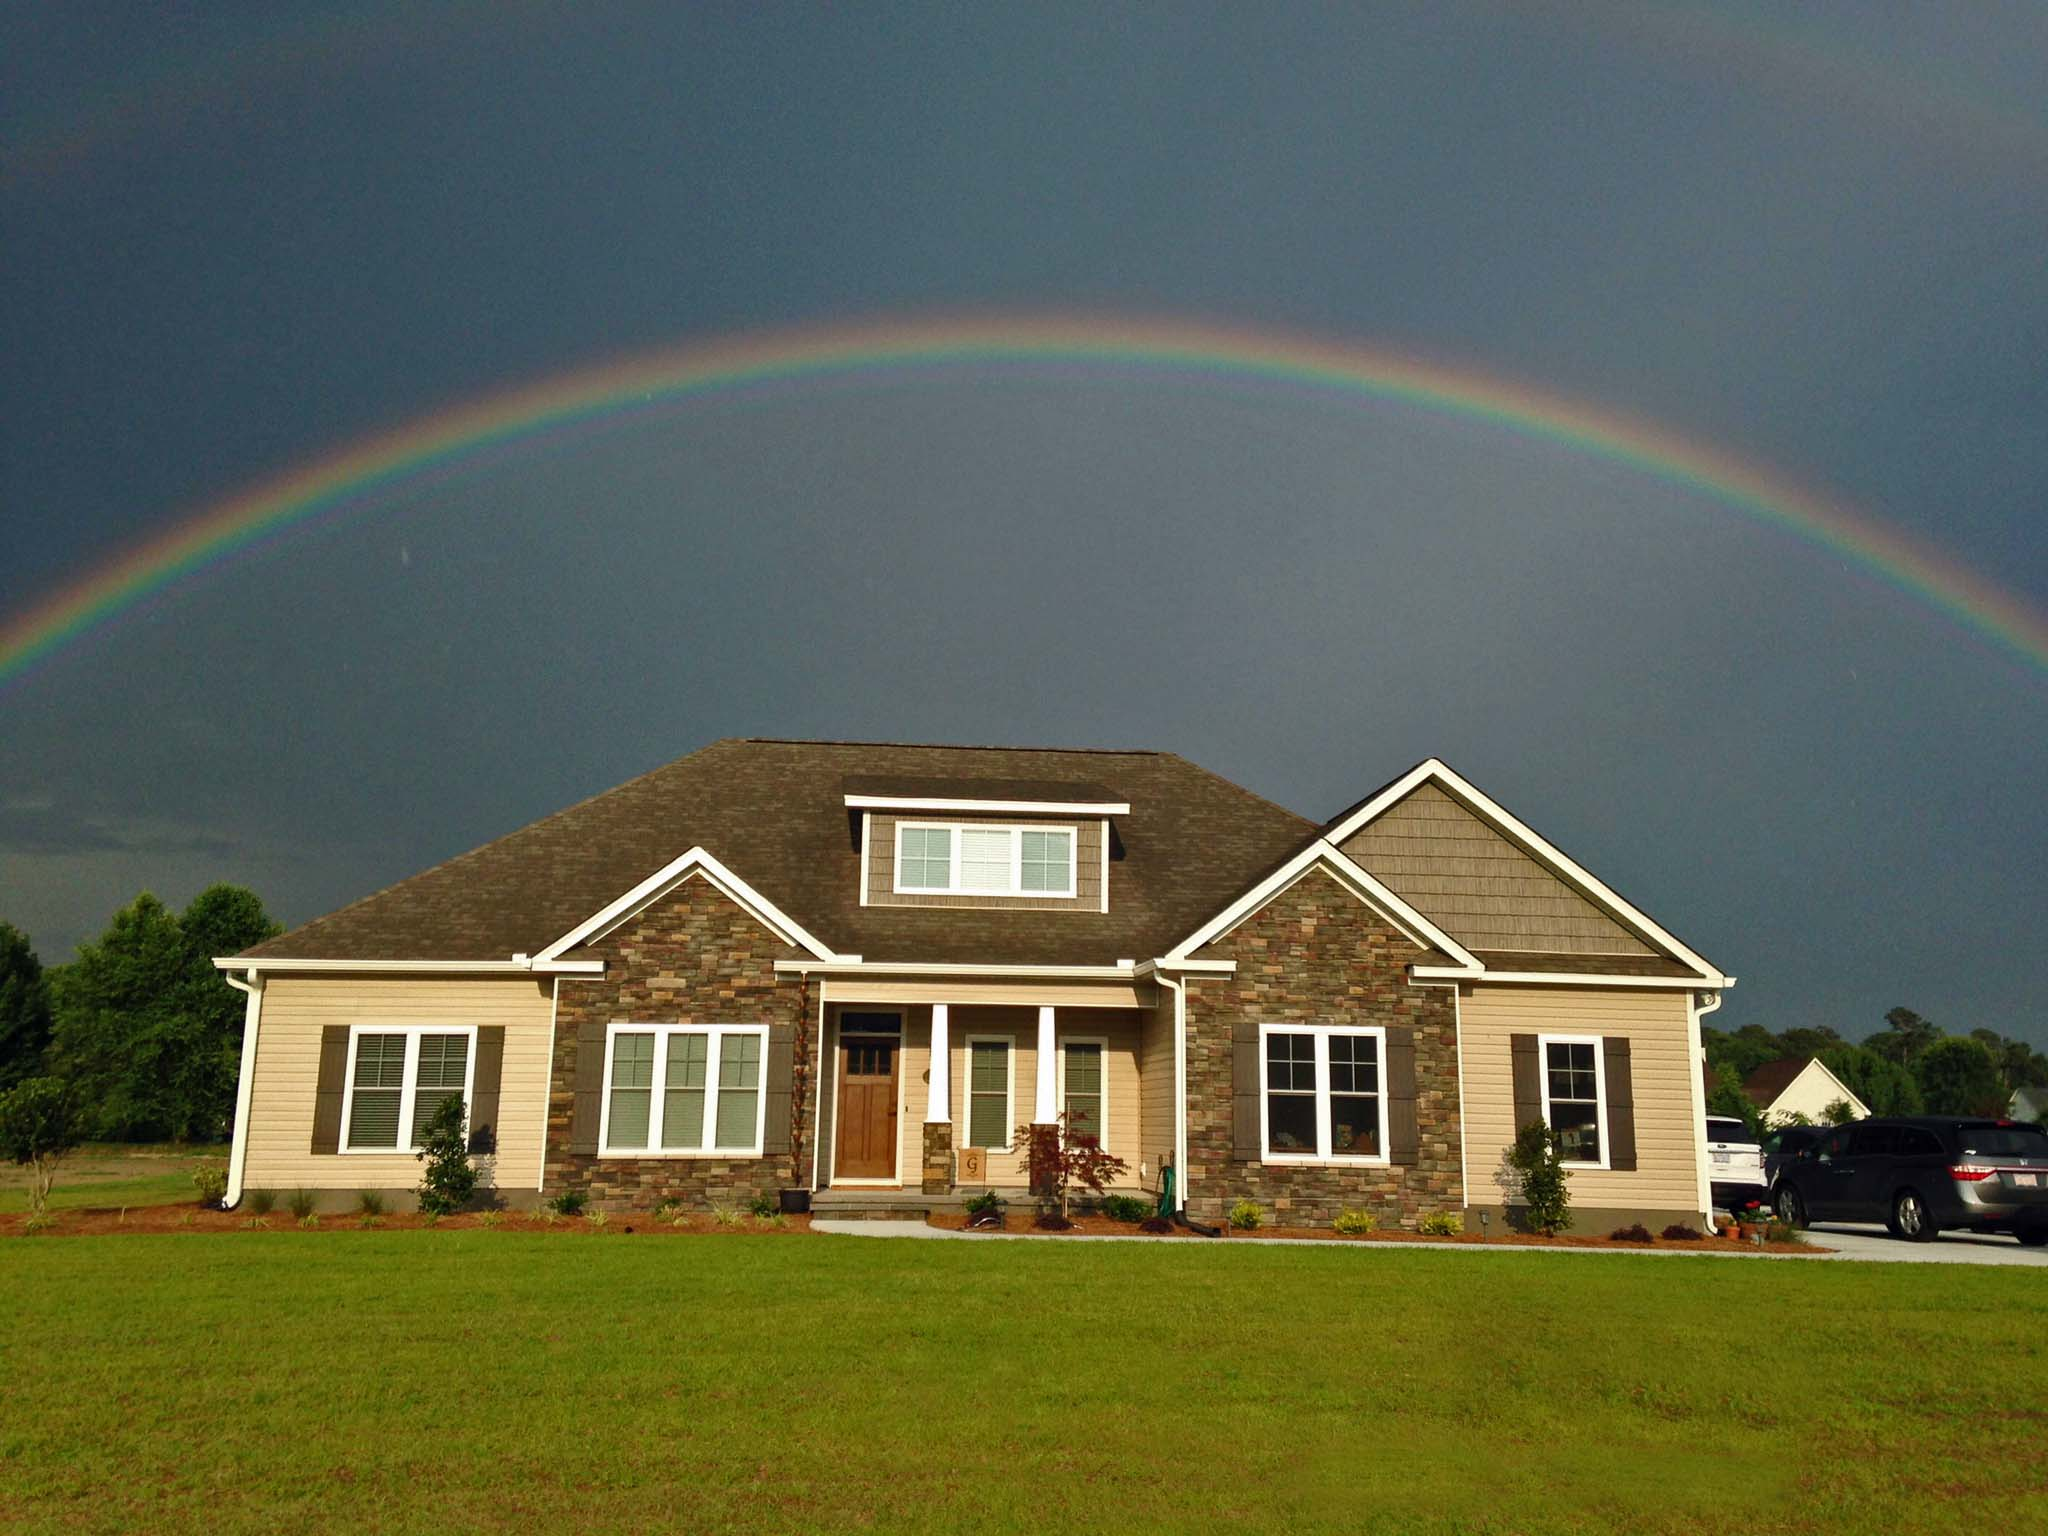 Quality Builder in Greenville, North Carolina